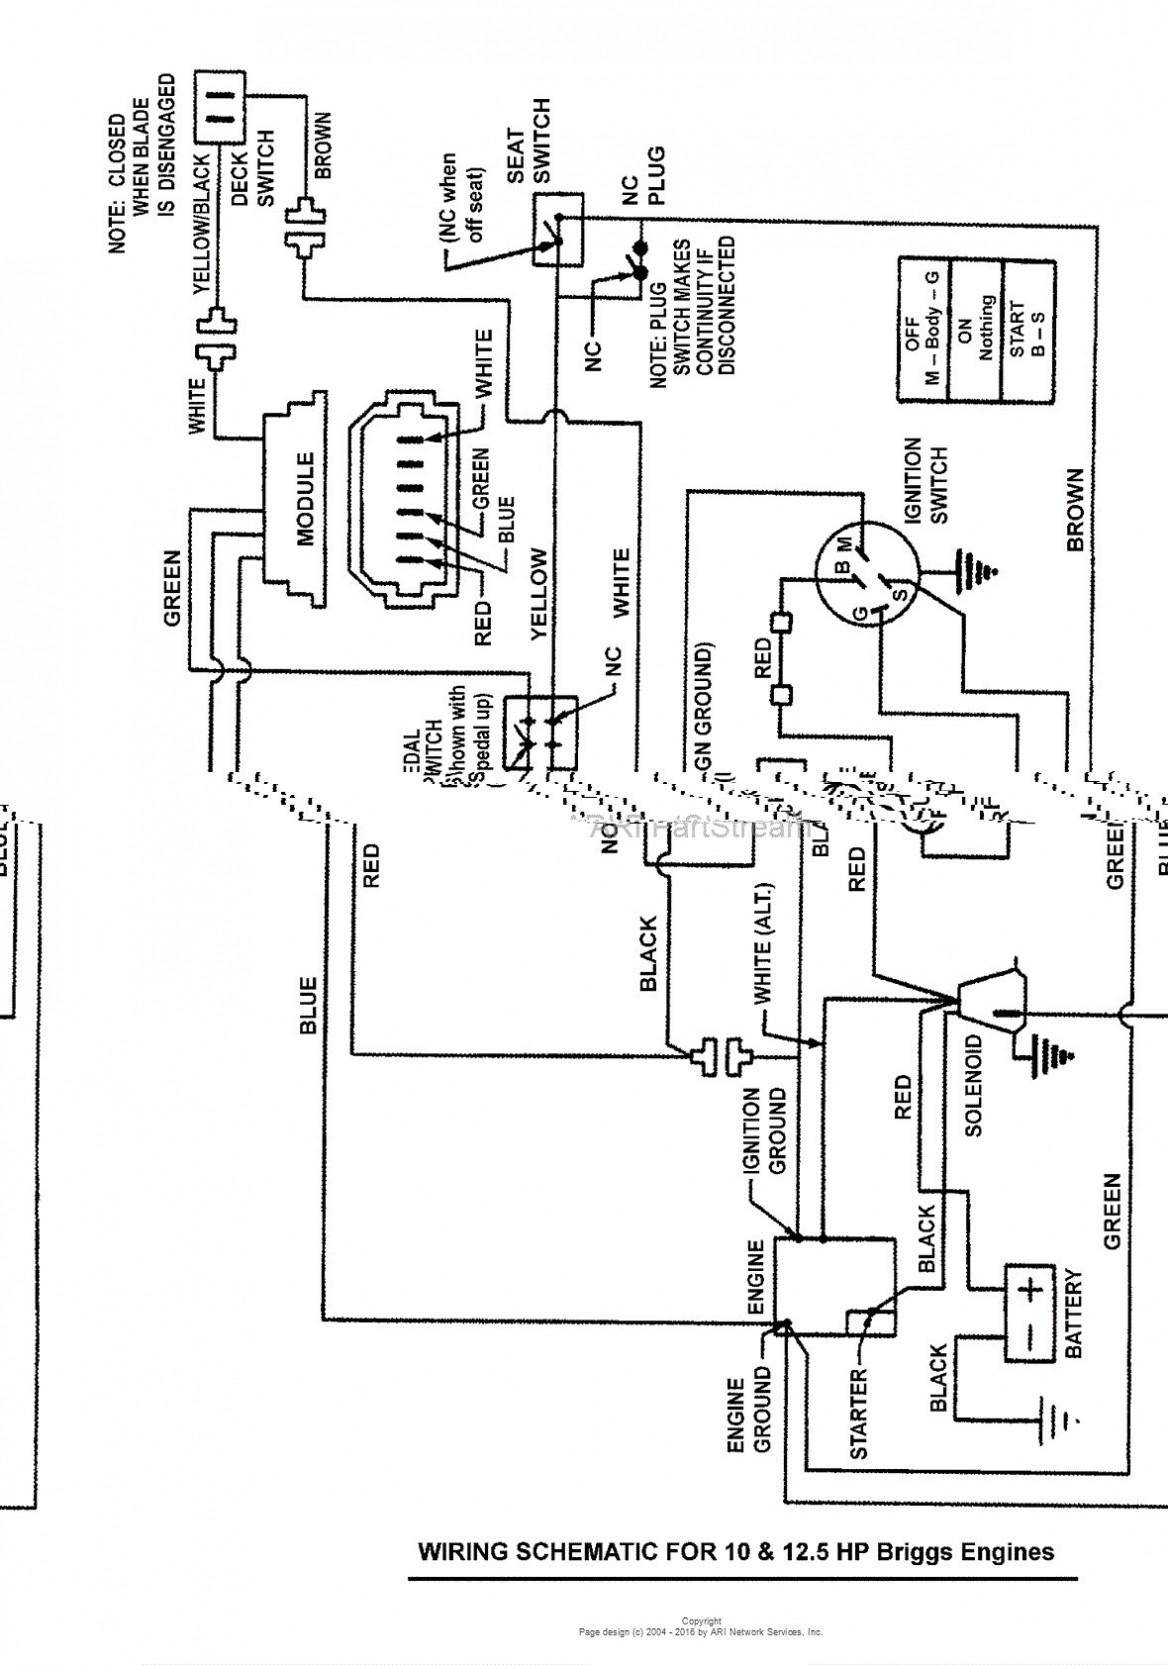 Wiring Diagram 17 Hp Briggs Stratton Wiring Diagram Hecho